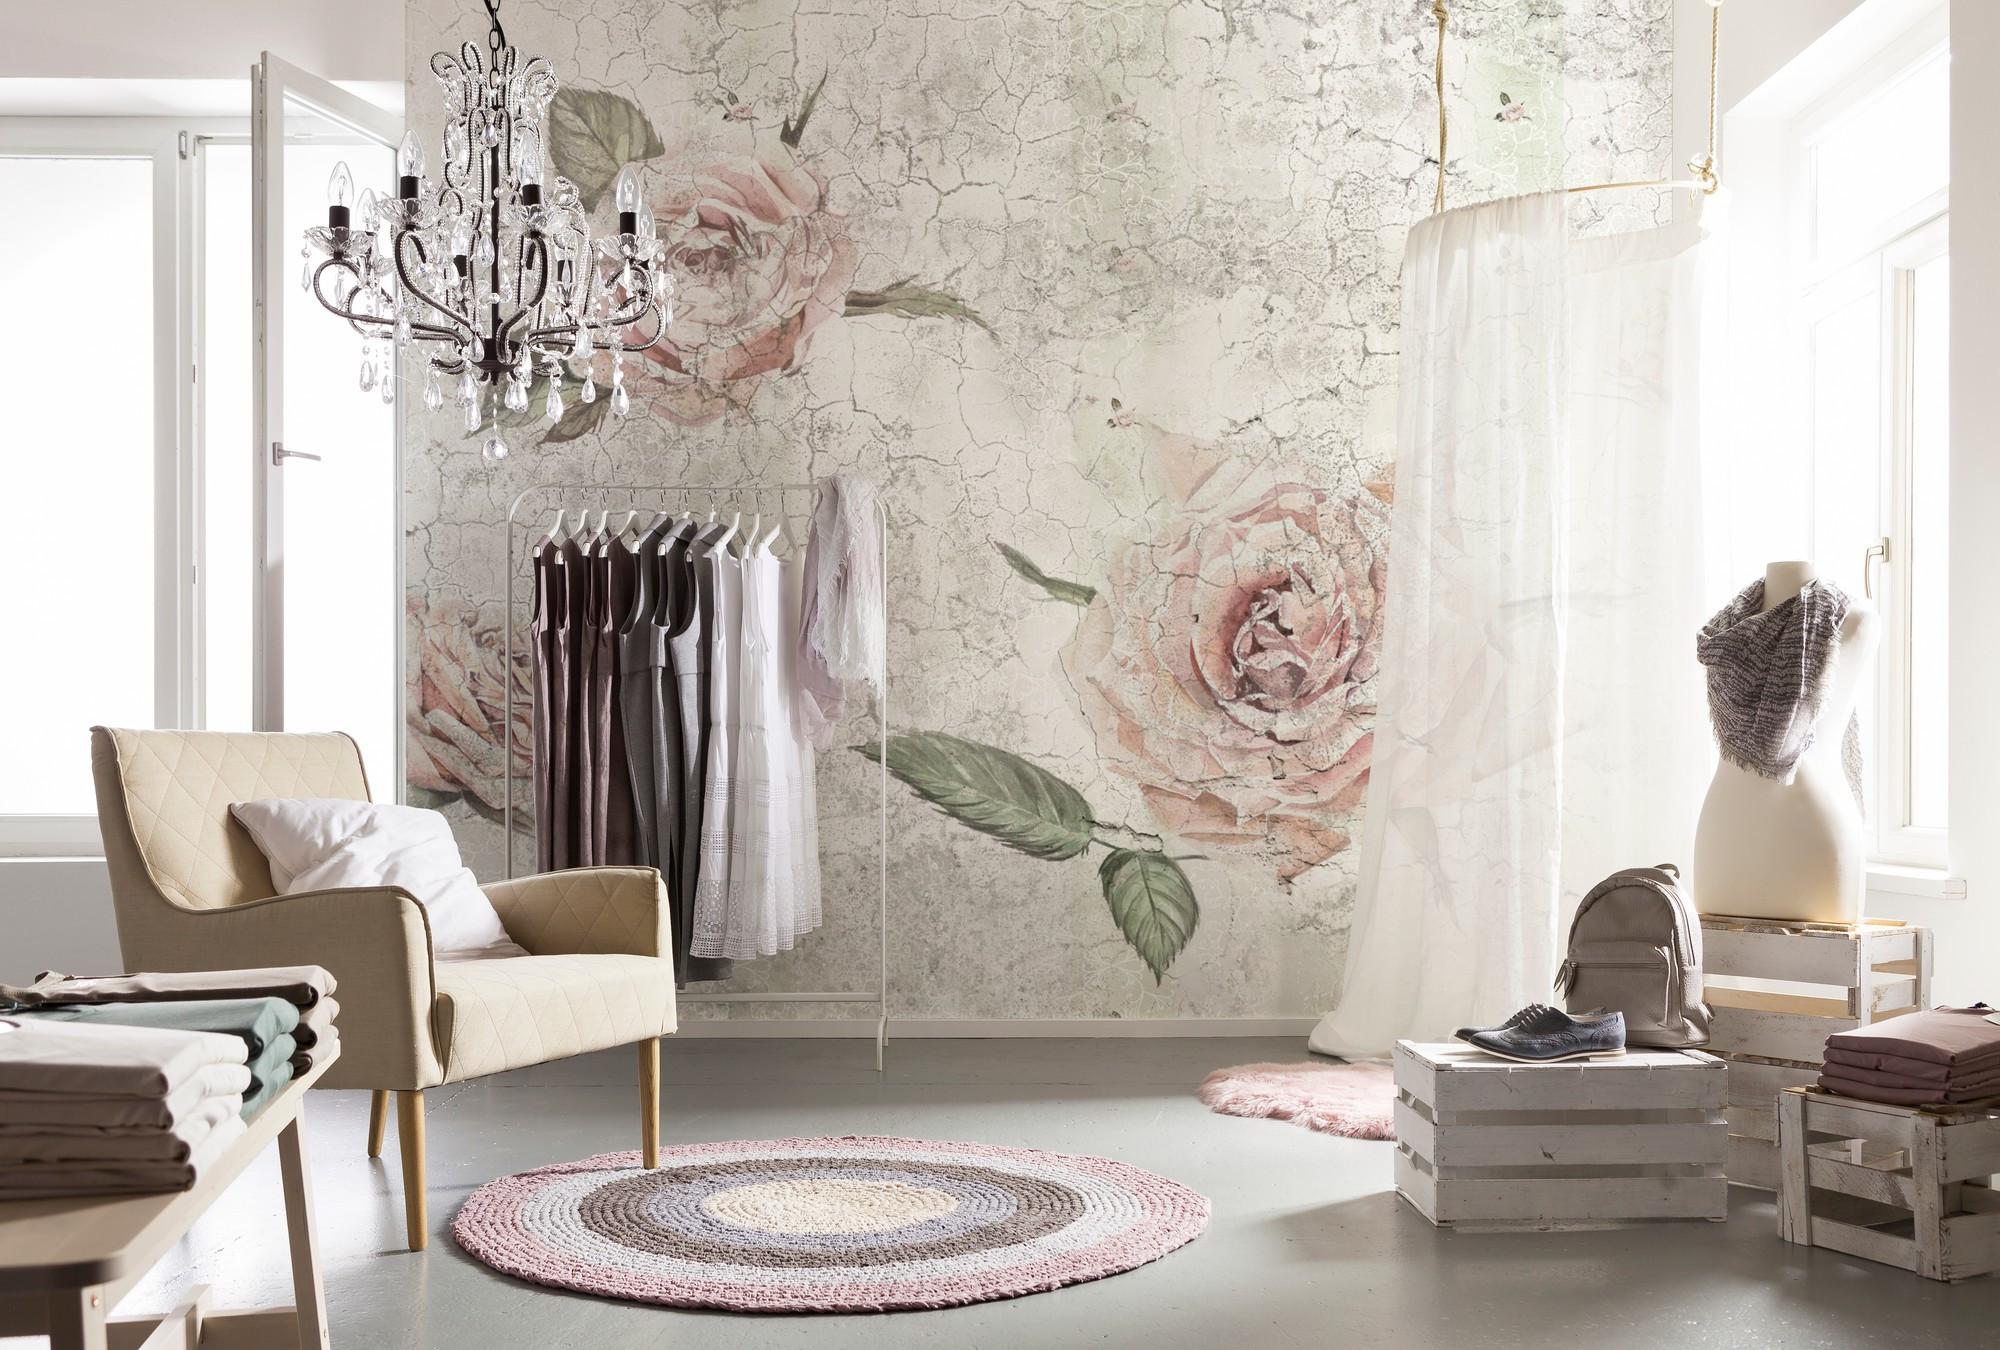 xxl4 049 fotooboi na flizelinovoy osnove komar sm rozy na freskah